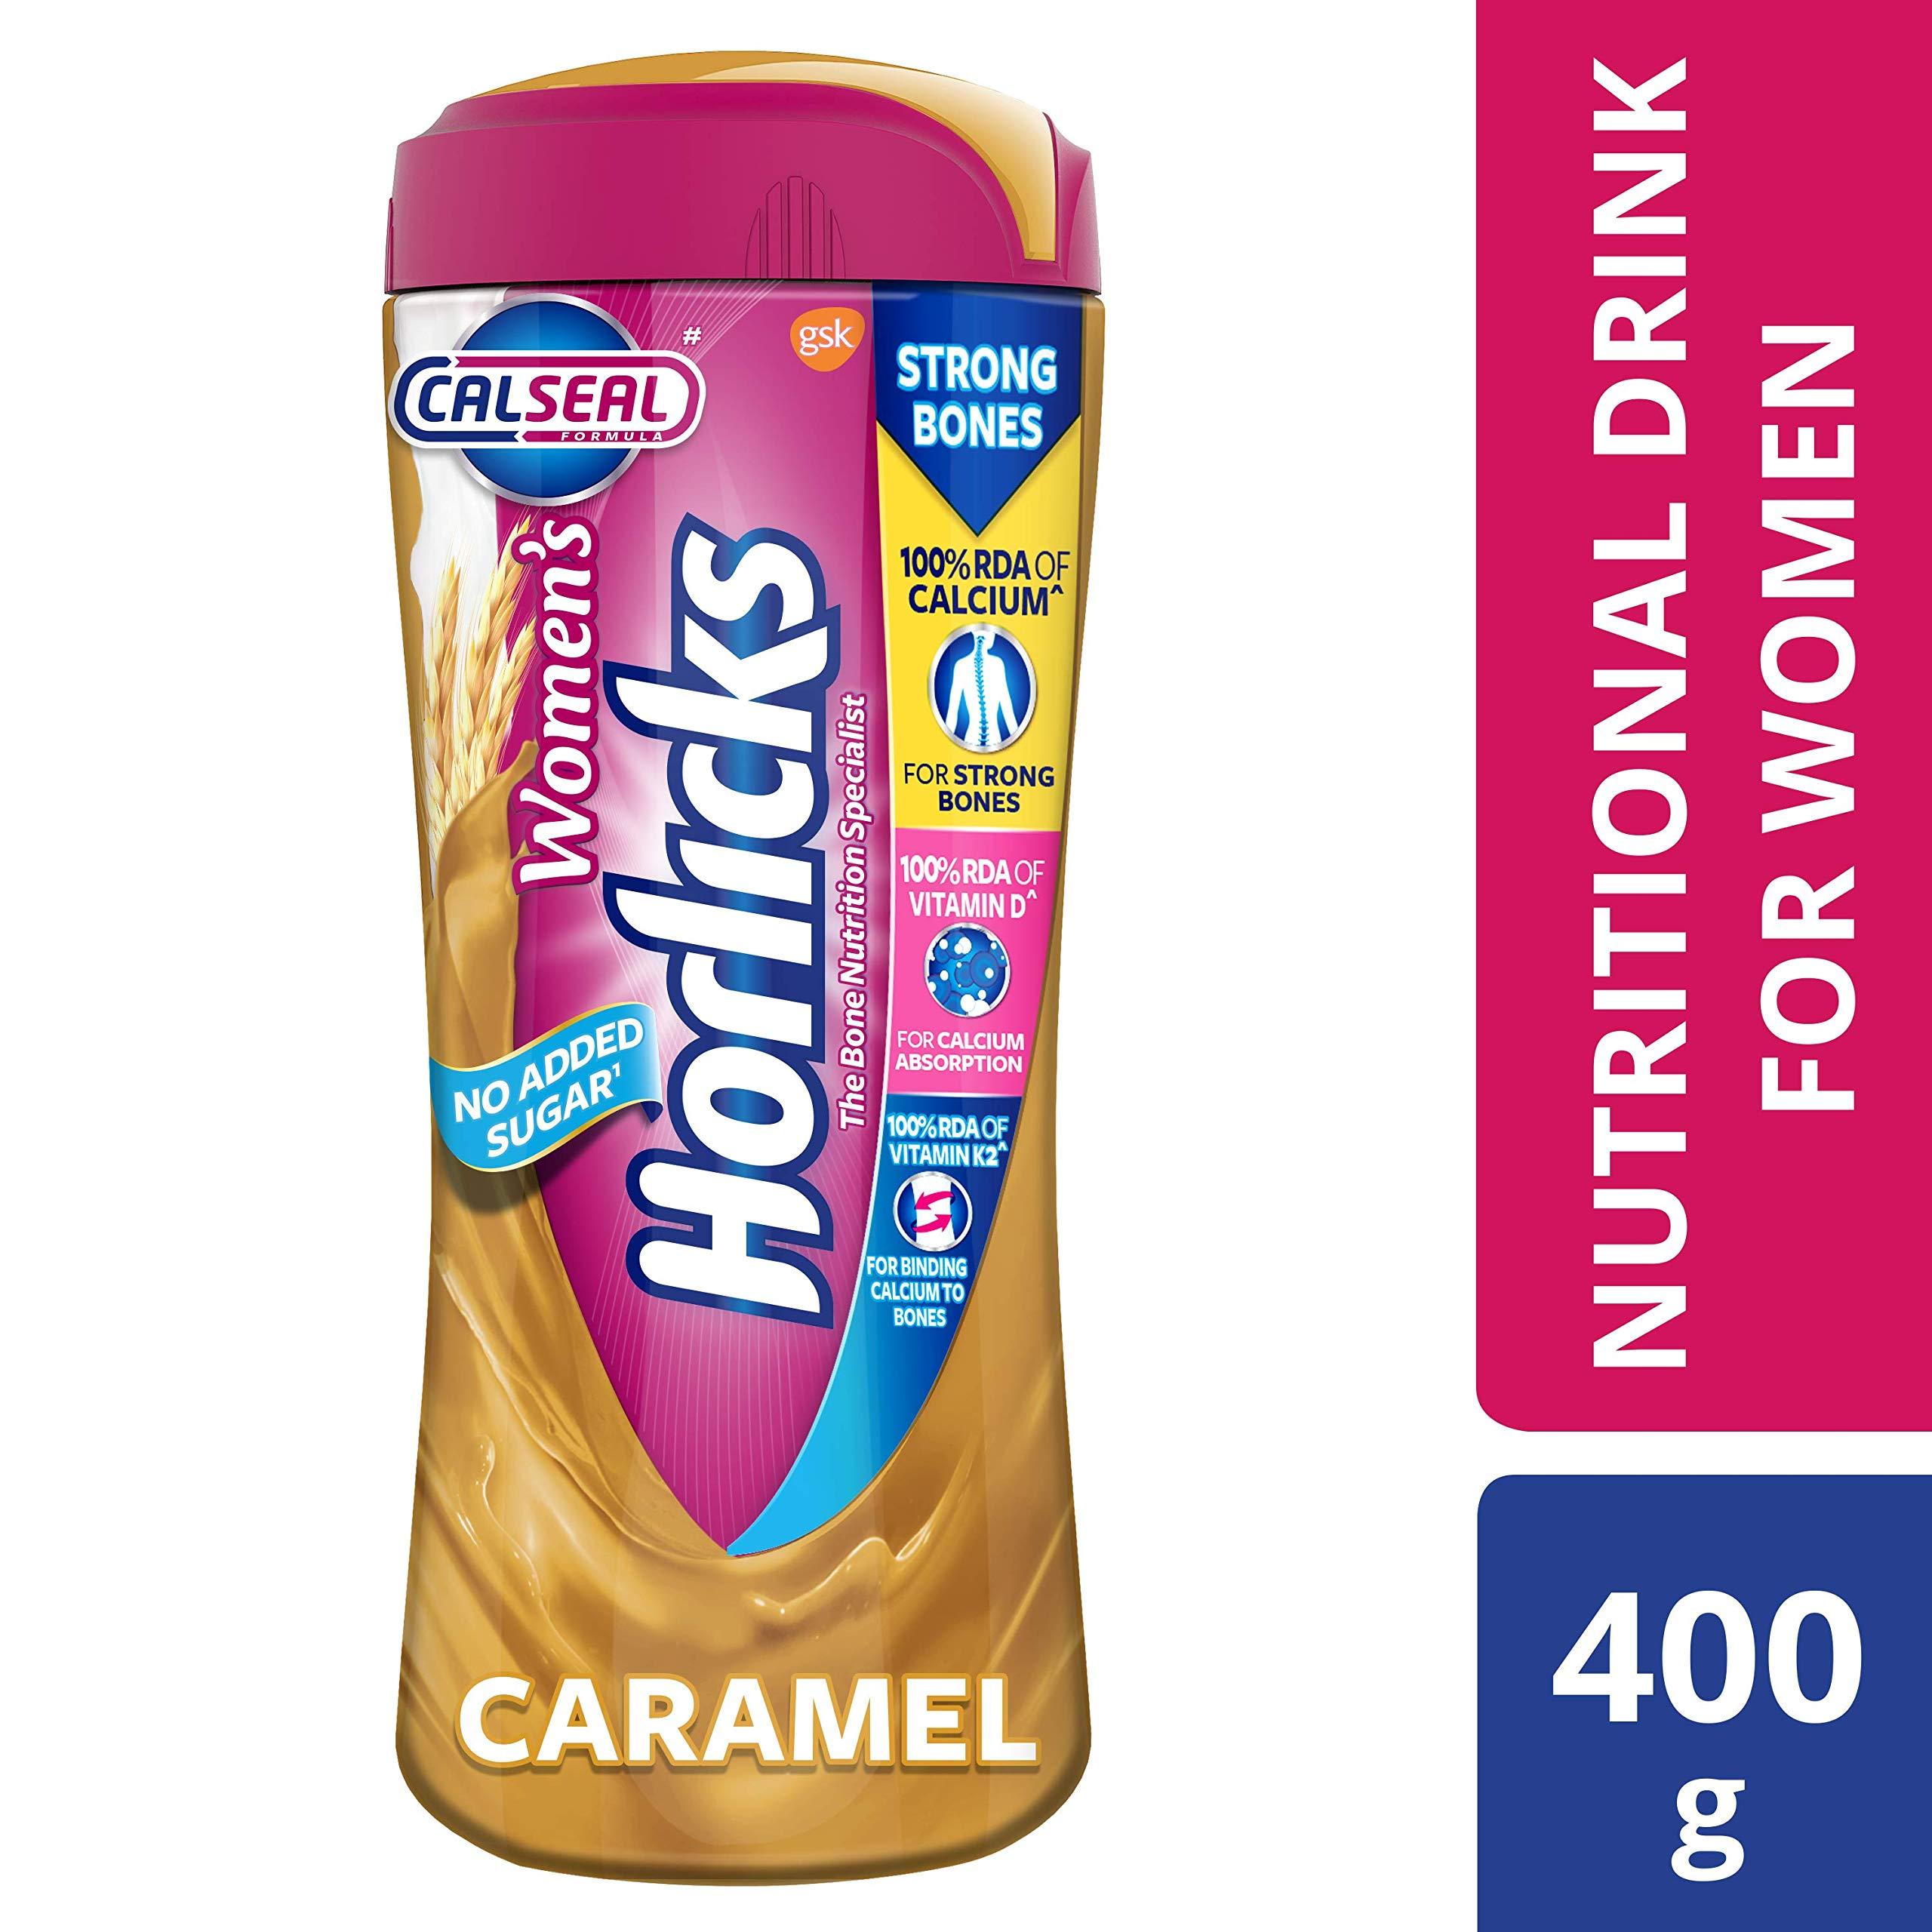 Horlicks Women's Health and Nutrition drink - 400g (Caramel flavor) product image